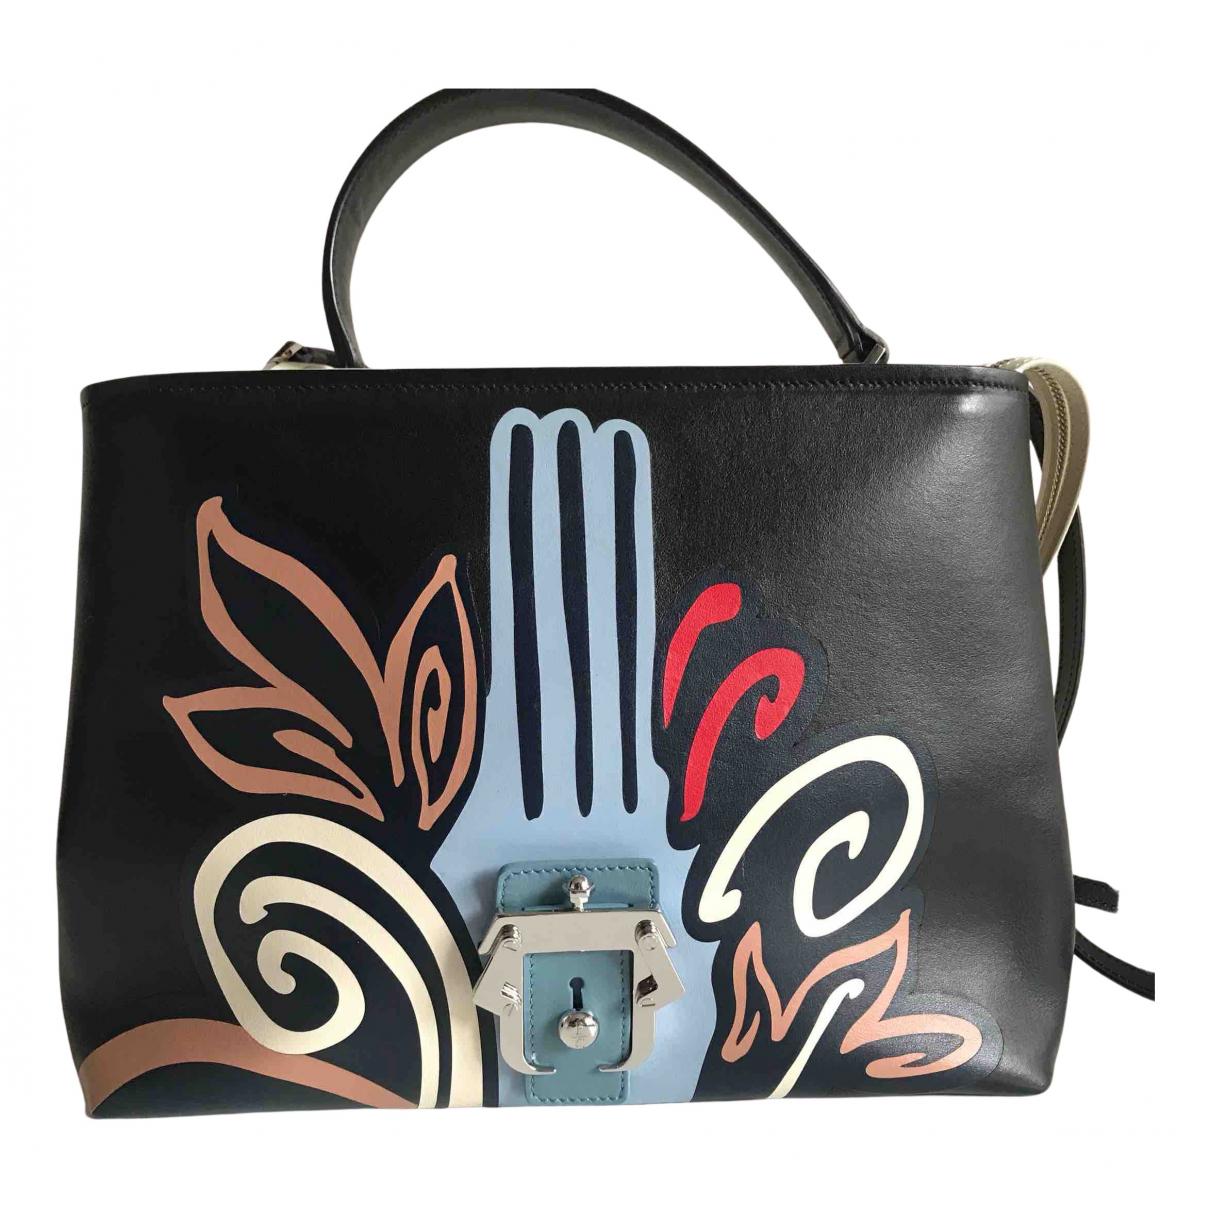 Paula Cademartori - Sac a main   pour femme en cuir - multicolore